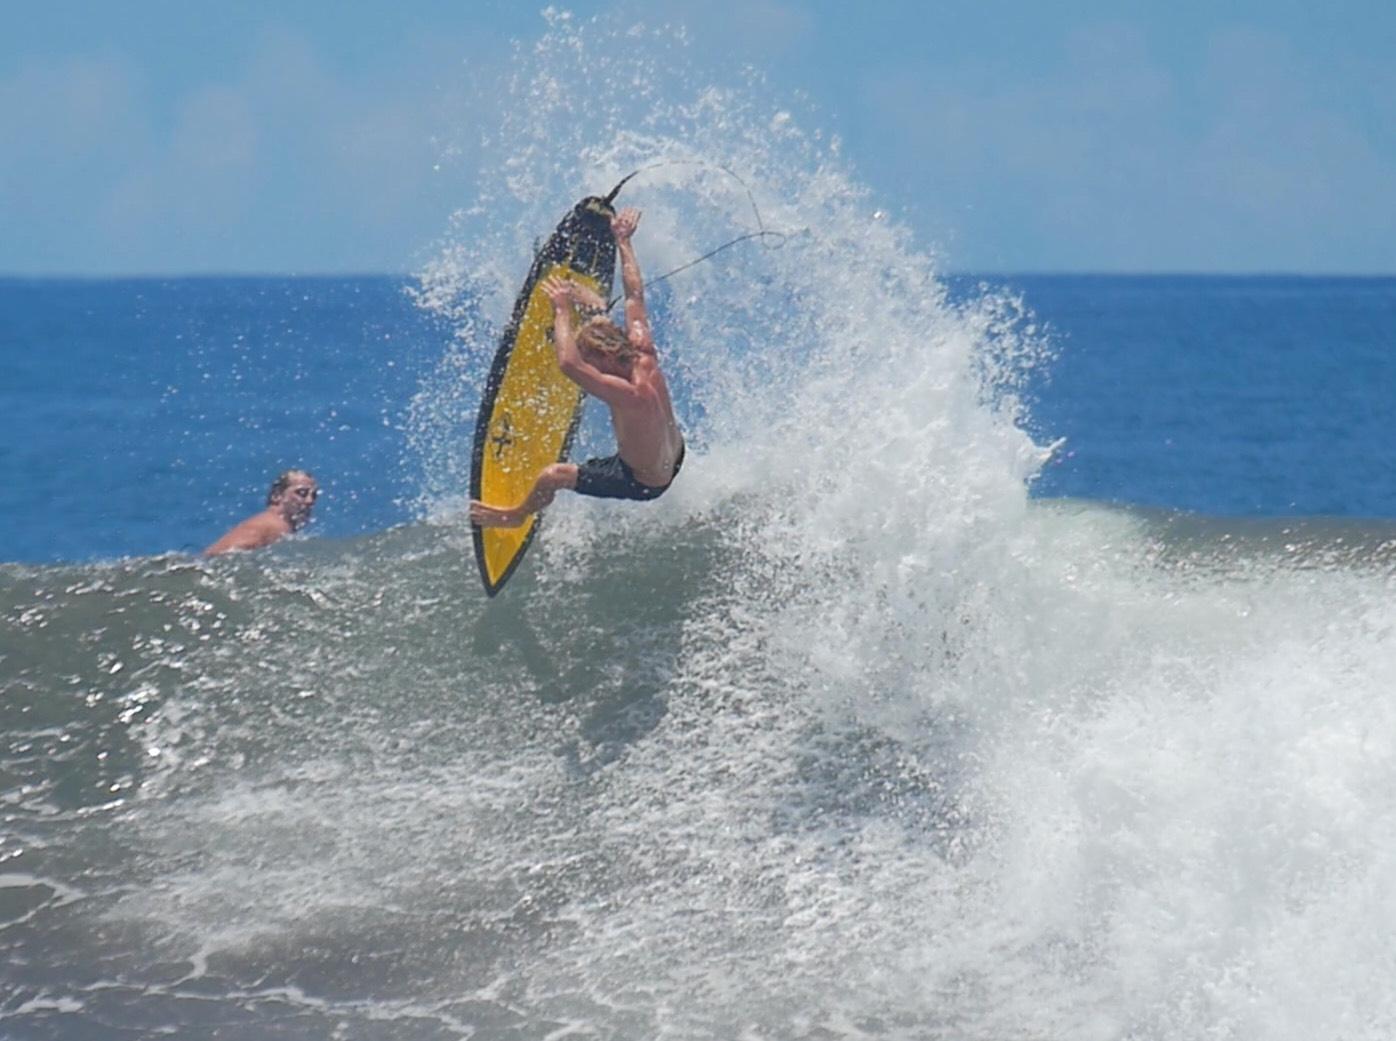 Local Maui surfer Tanner Hendrickson